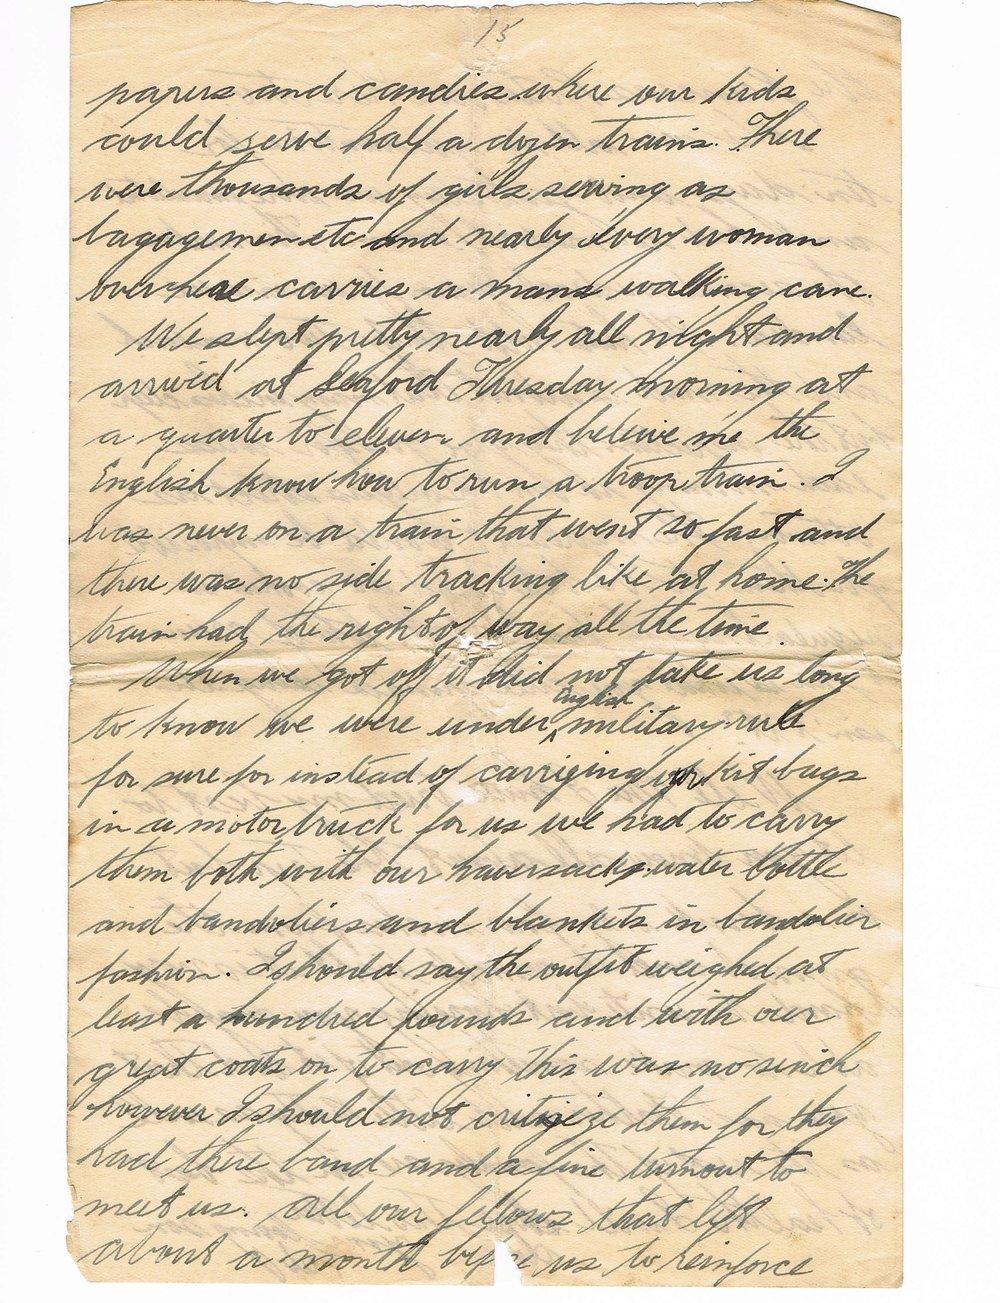 Basil Vale January 2, 1918 letter - page 15.jpg